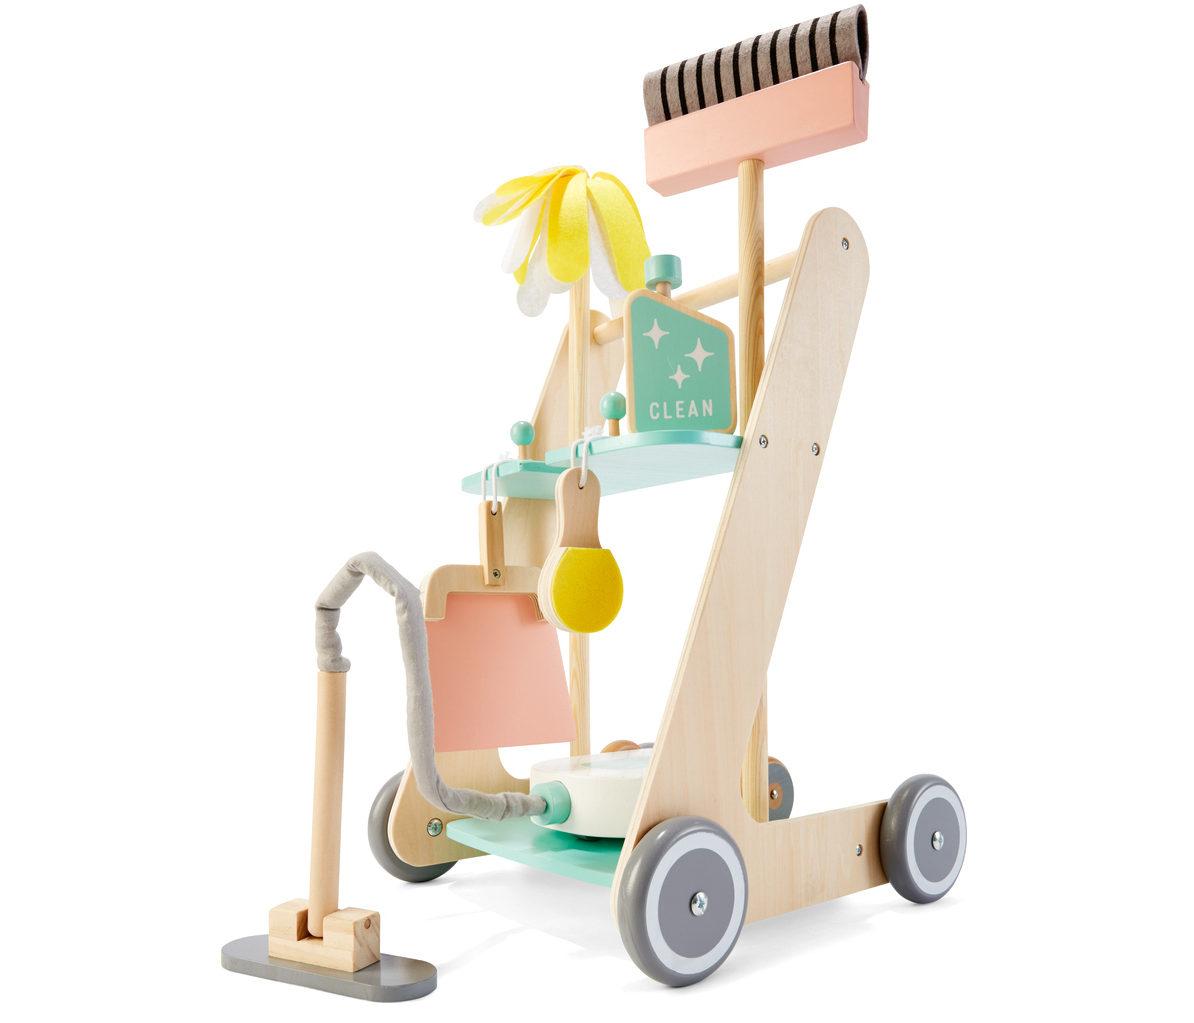 Kmart Wooden Toy